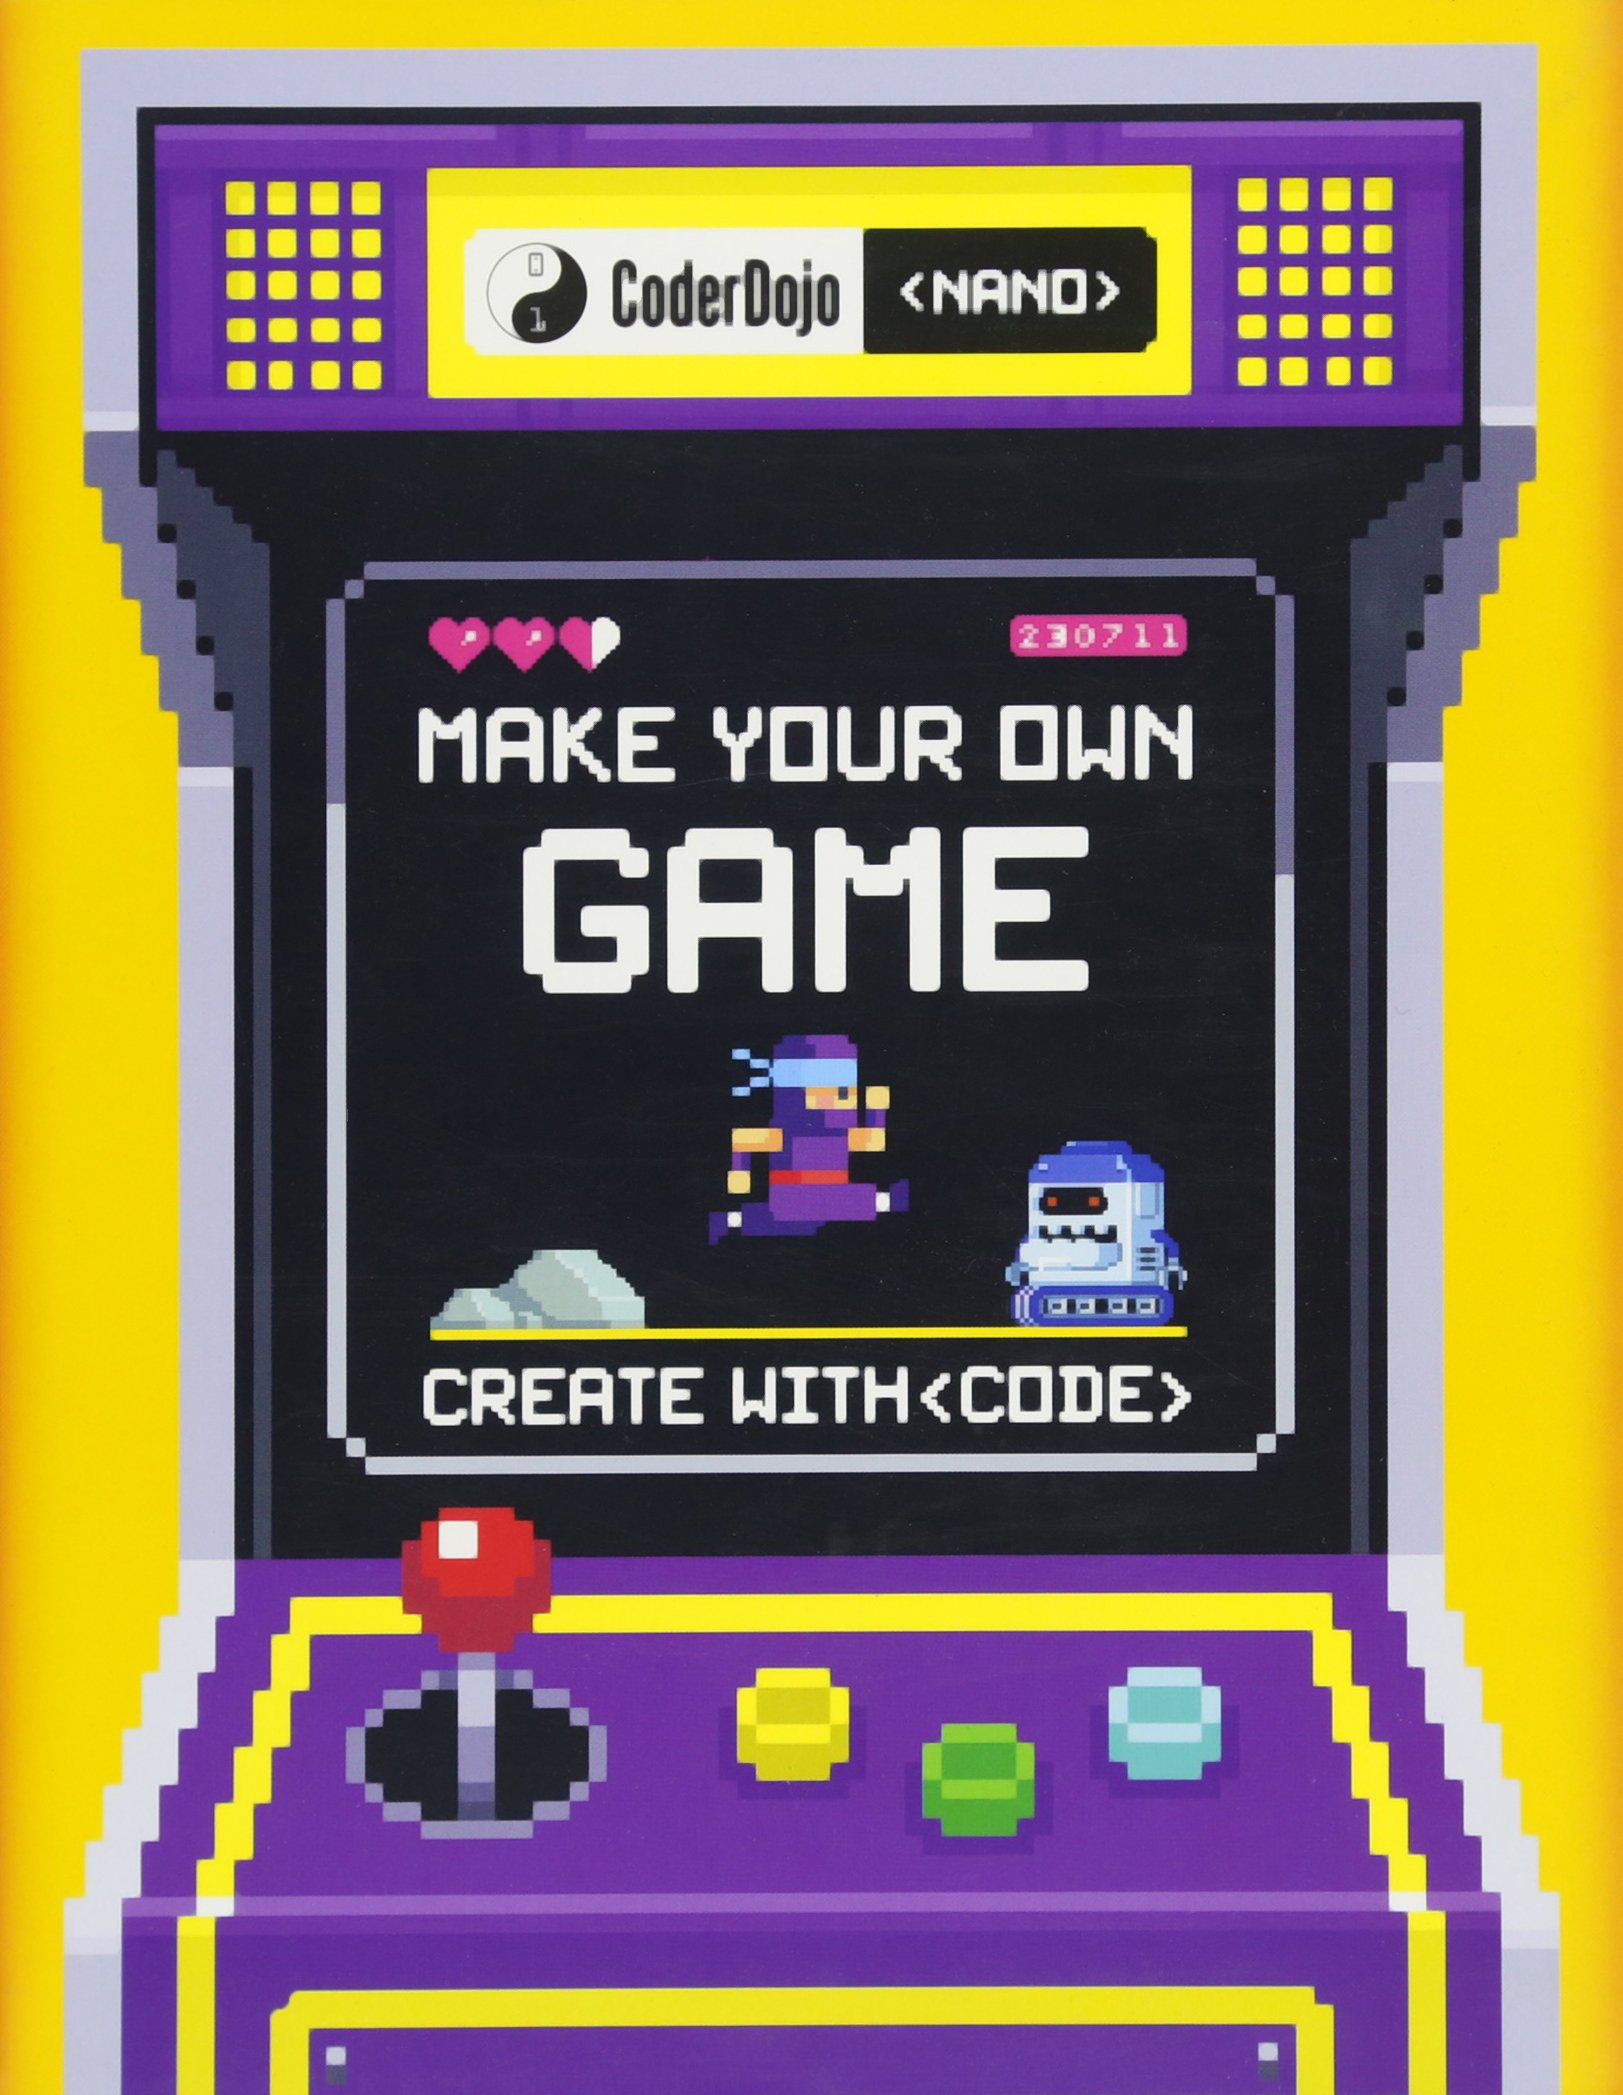 CoderDojo Nano: Make Your Own Game: Create With Code